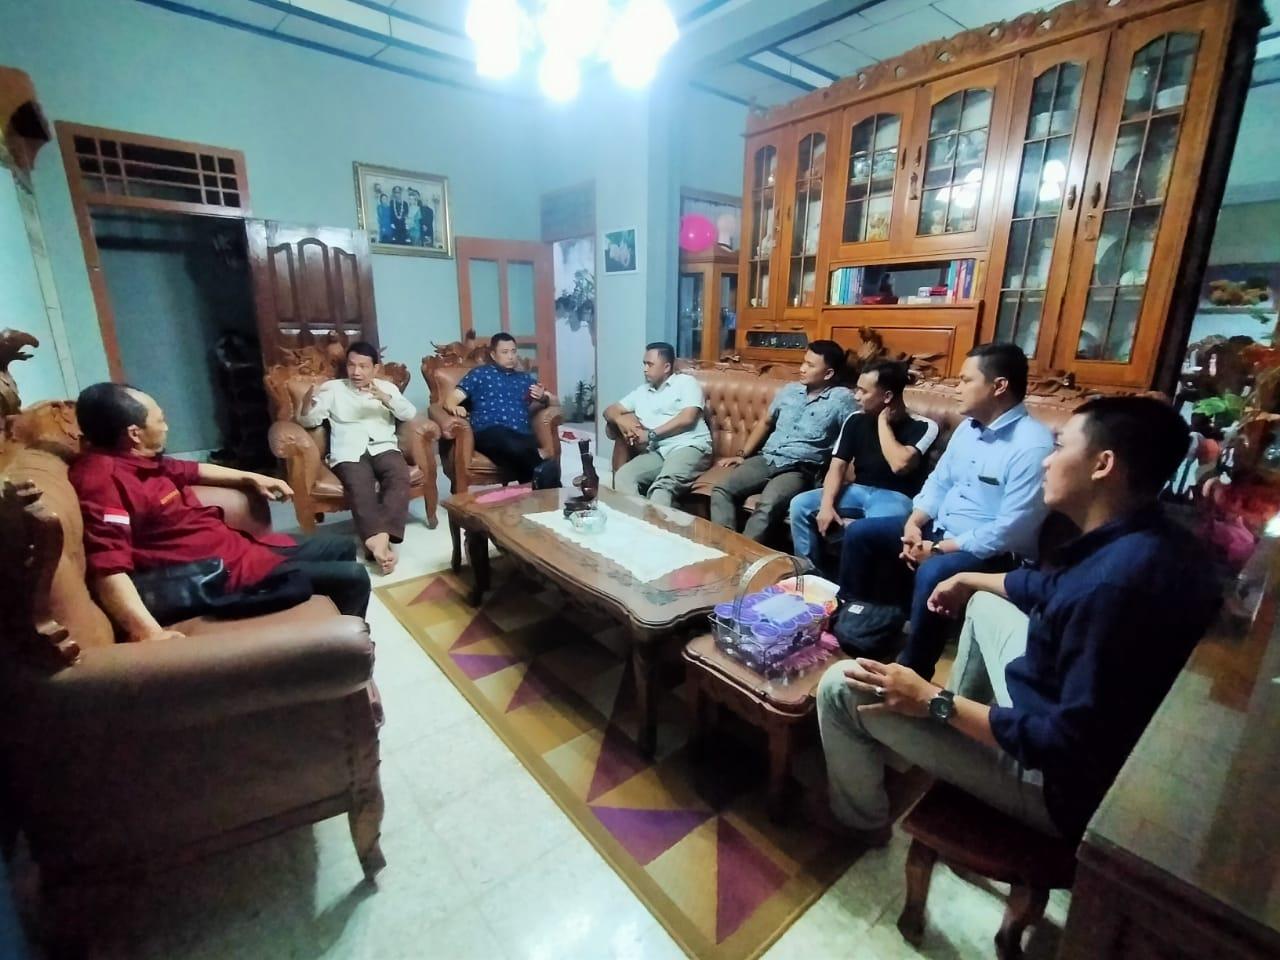 Kamis Pekan Depan, PT HIM Diminta Majelis Hakim Menjawab Gugatan Lima Keturunan Bandardewa di PTUN